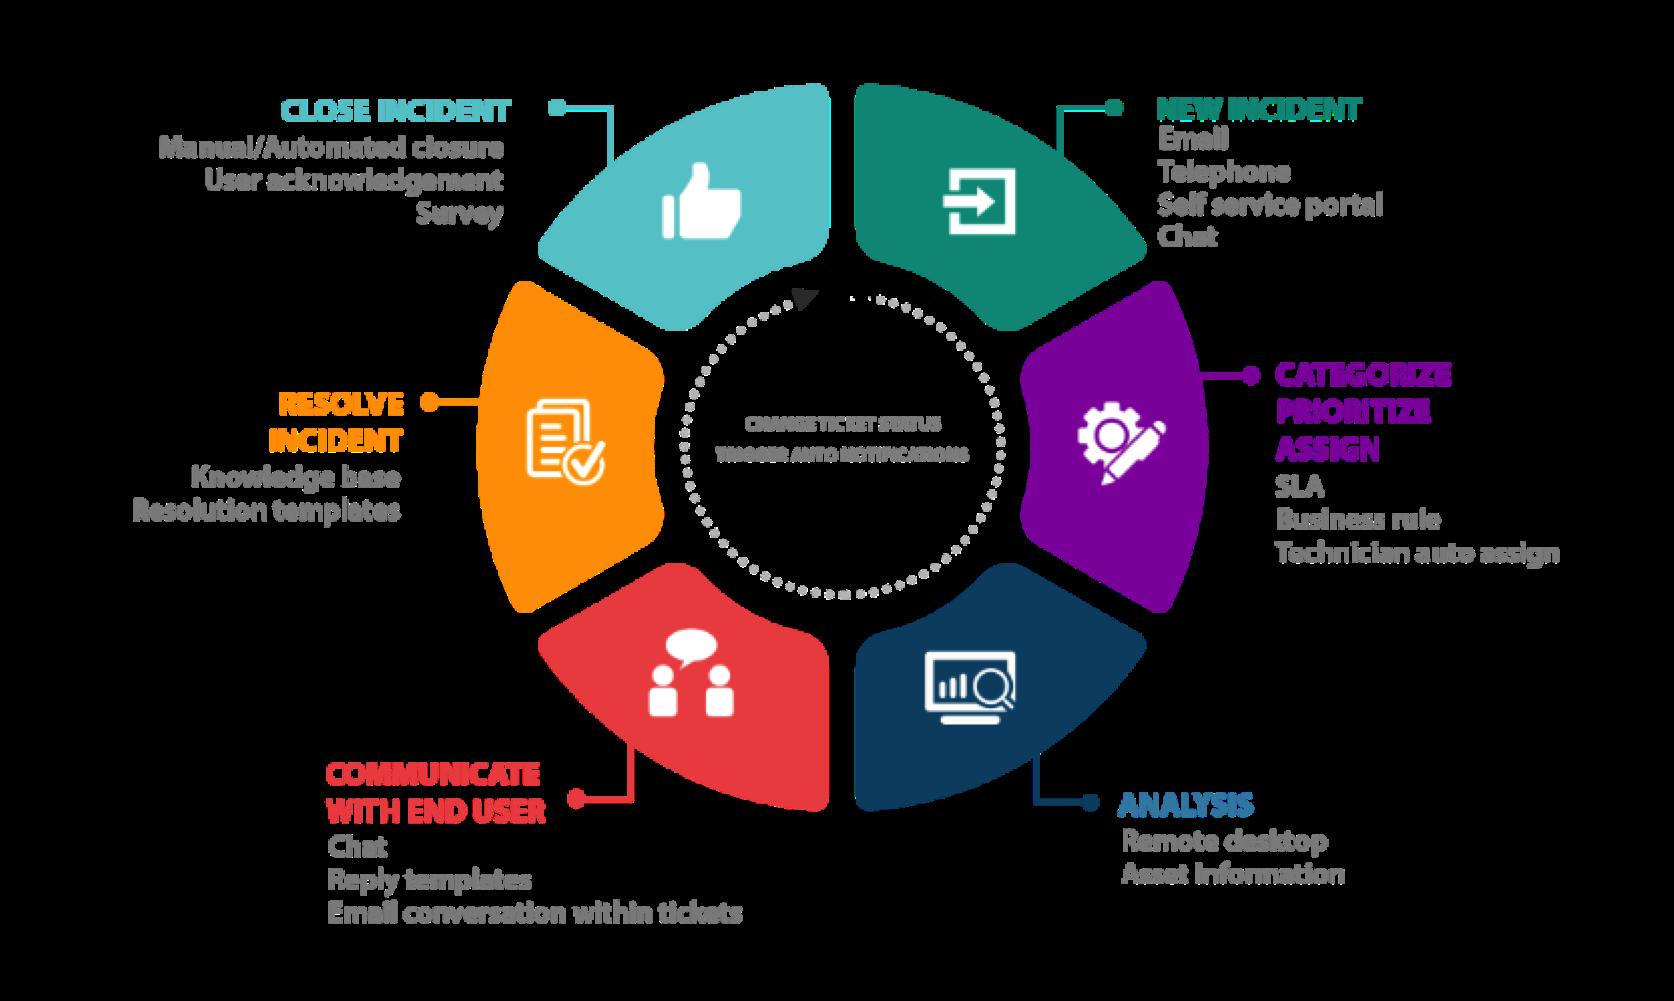 Incident Management Workflow Process